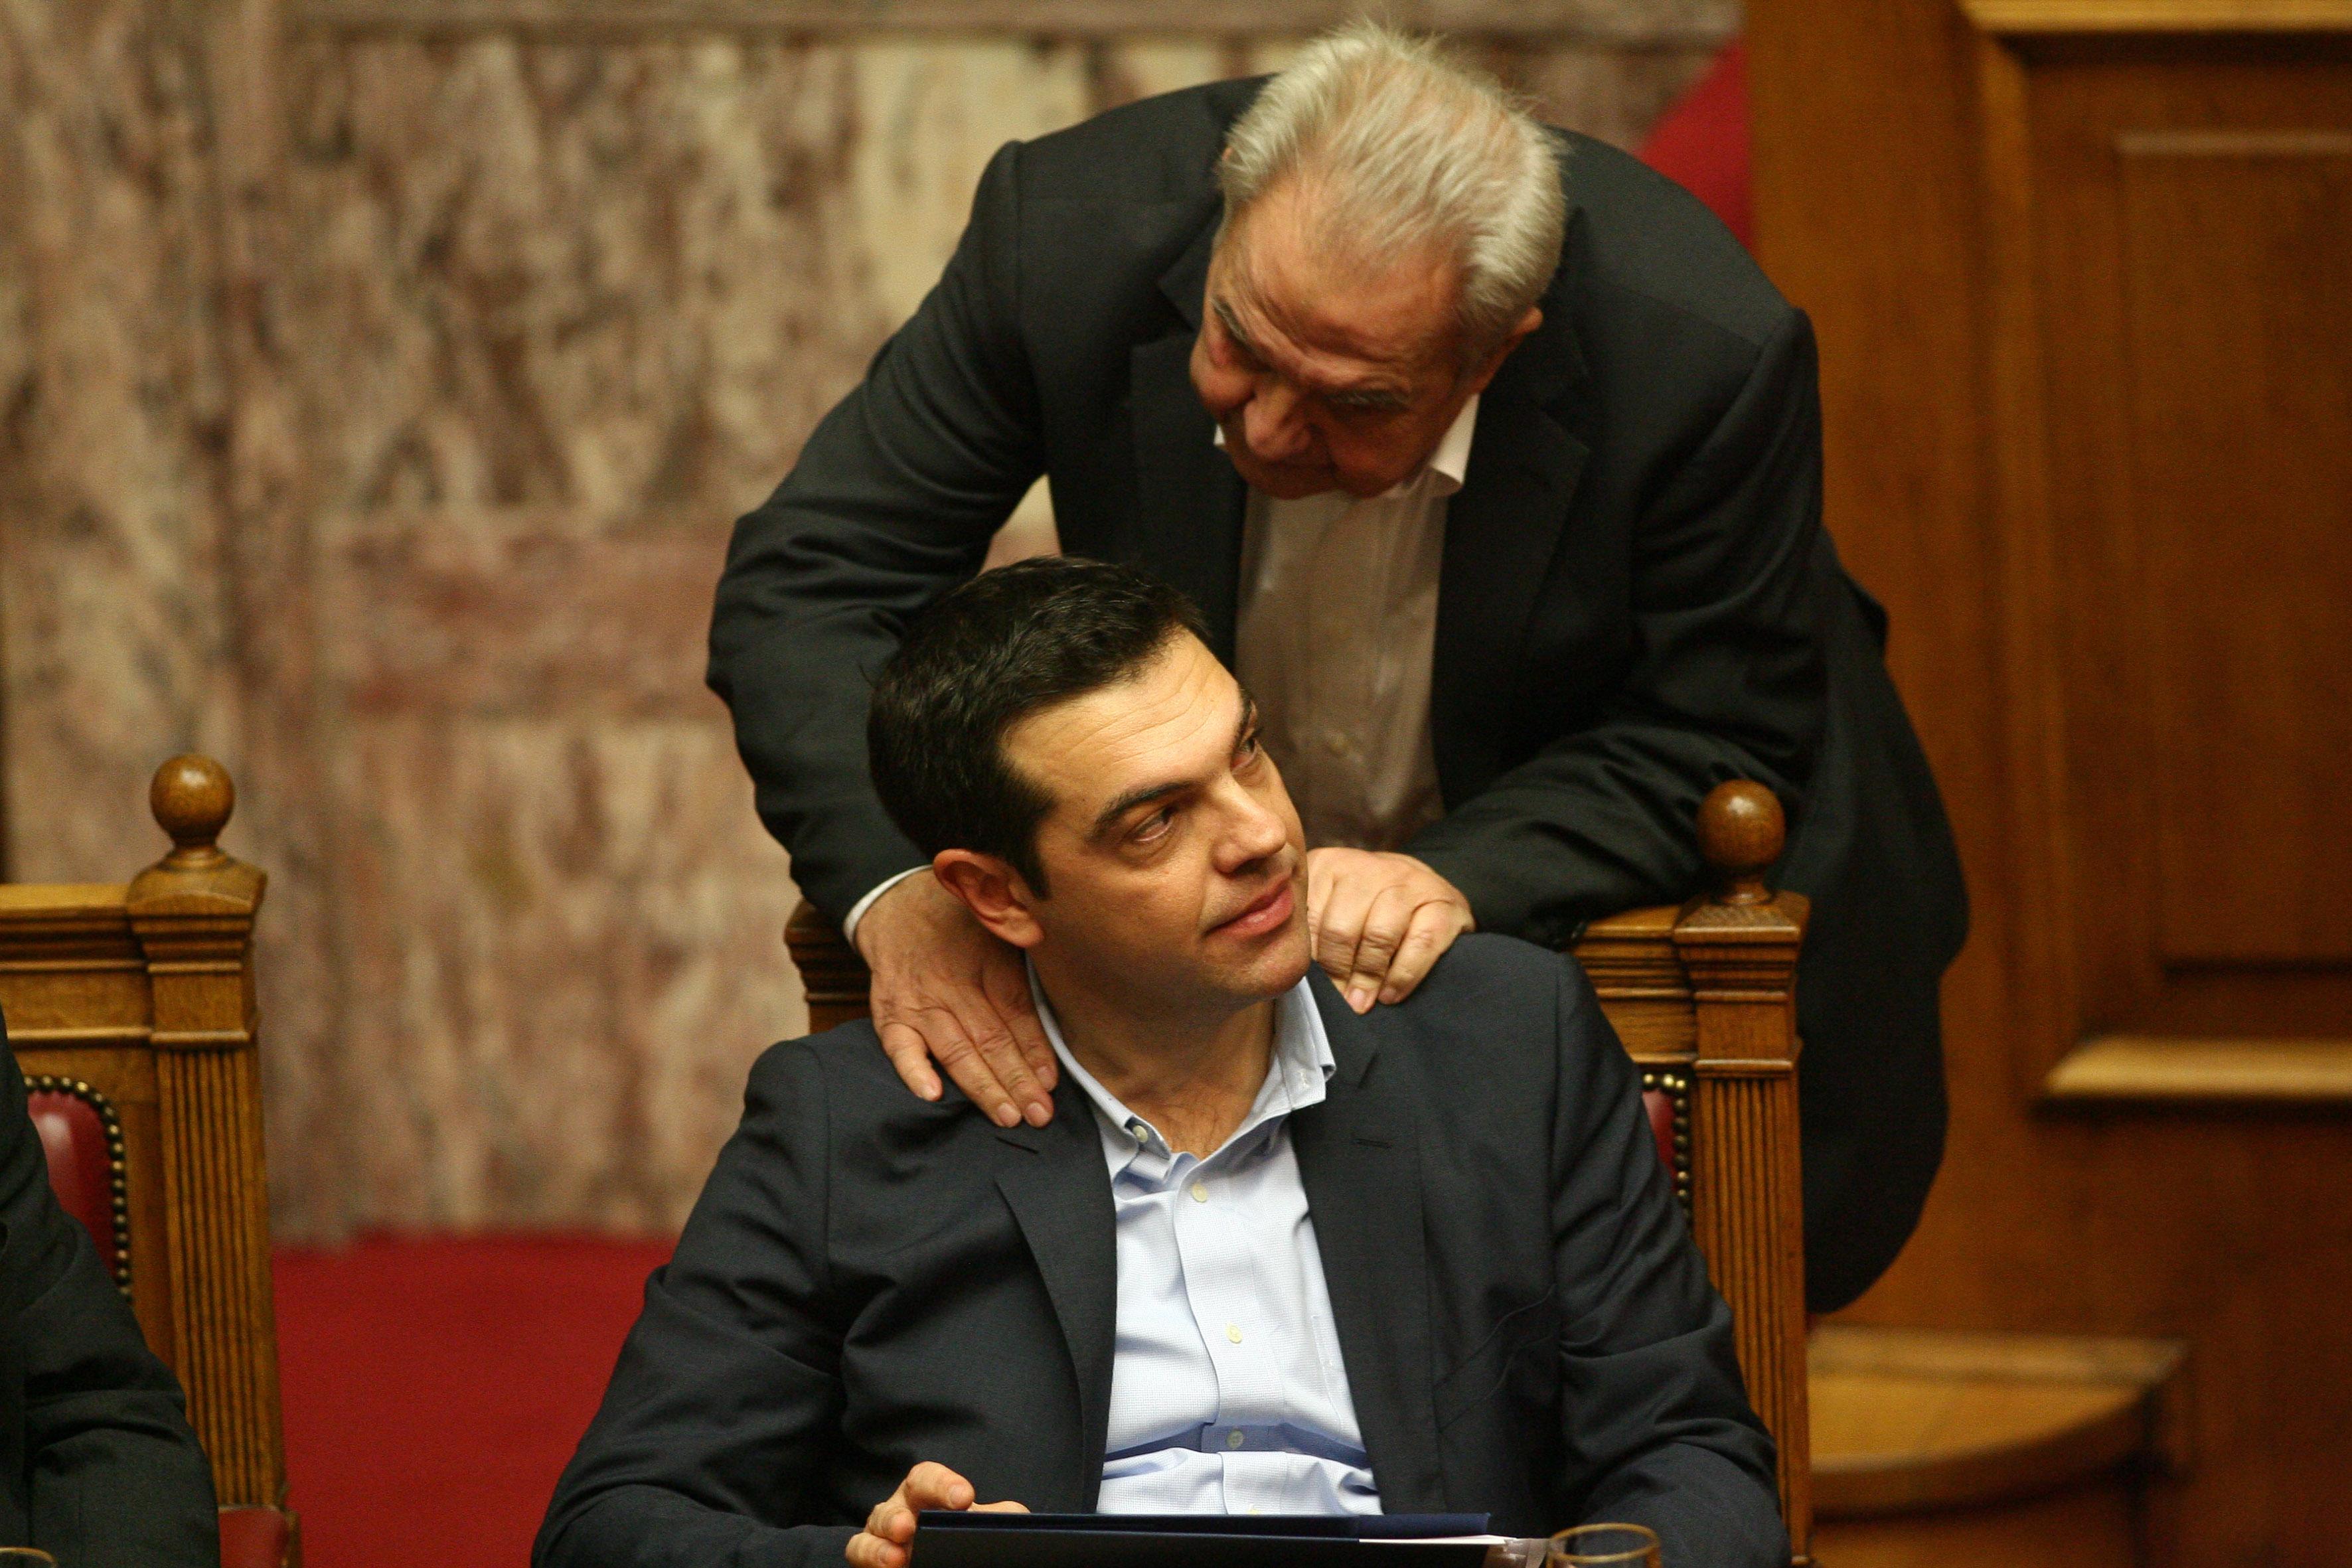 FAZ: Μπλεγμένος σε σκάνδαλο ο πολιτικός «πατέρας» του Τσίπρα